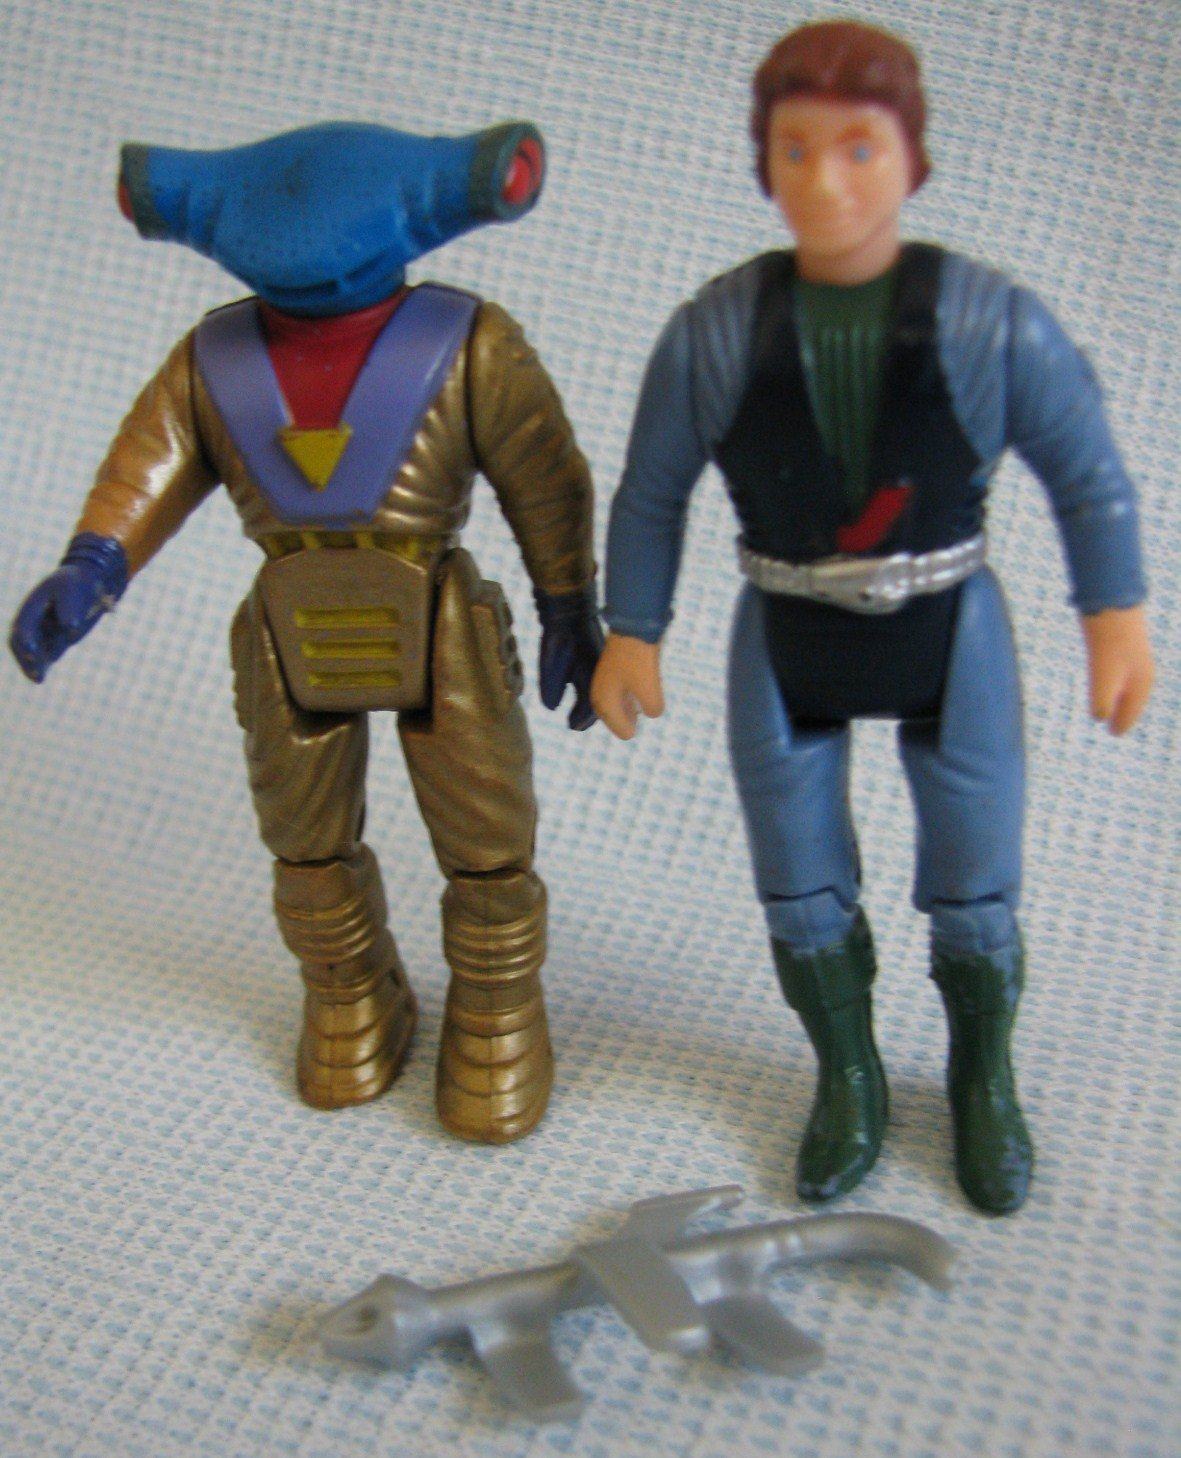 Vintage DinoRiders Sky + Finn Action Figures